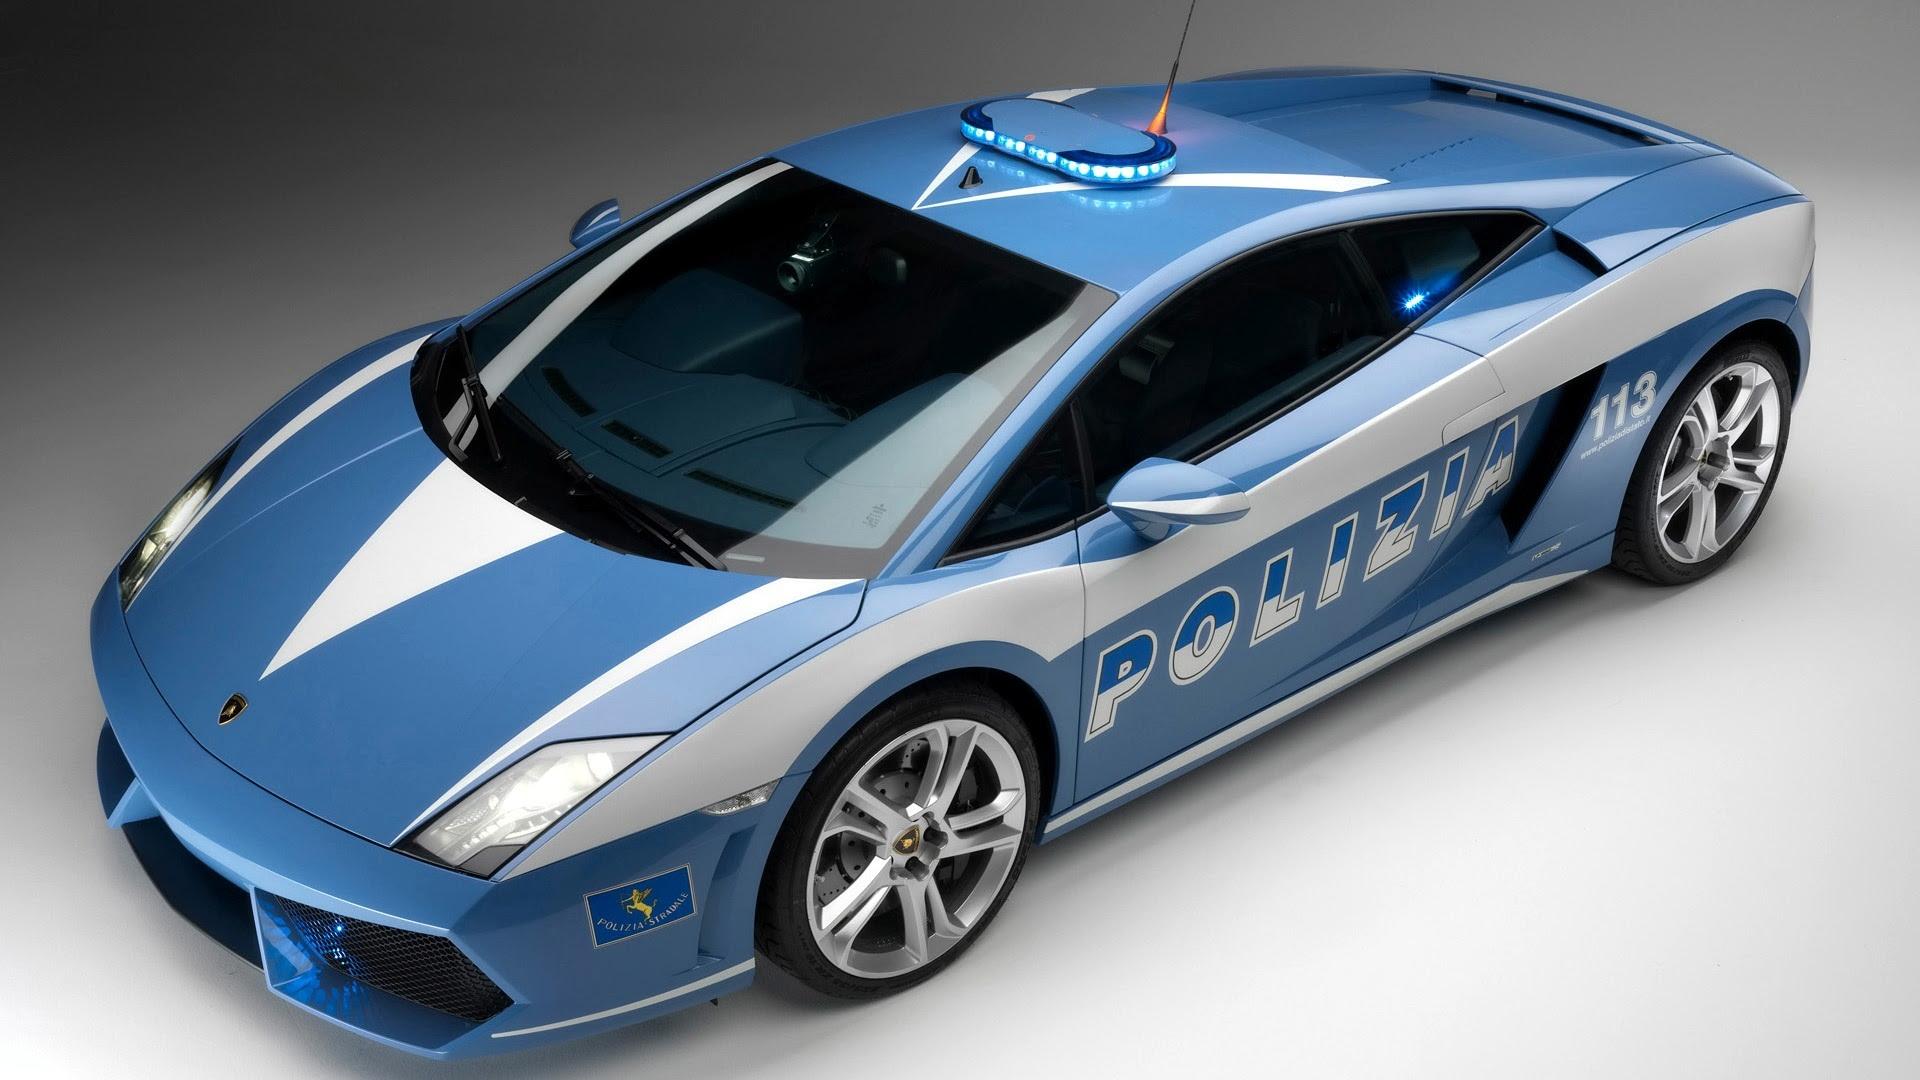 Lamborghini Gallardo Polizia Wallpapers In Format For